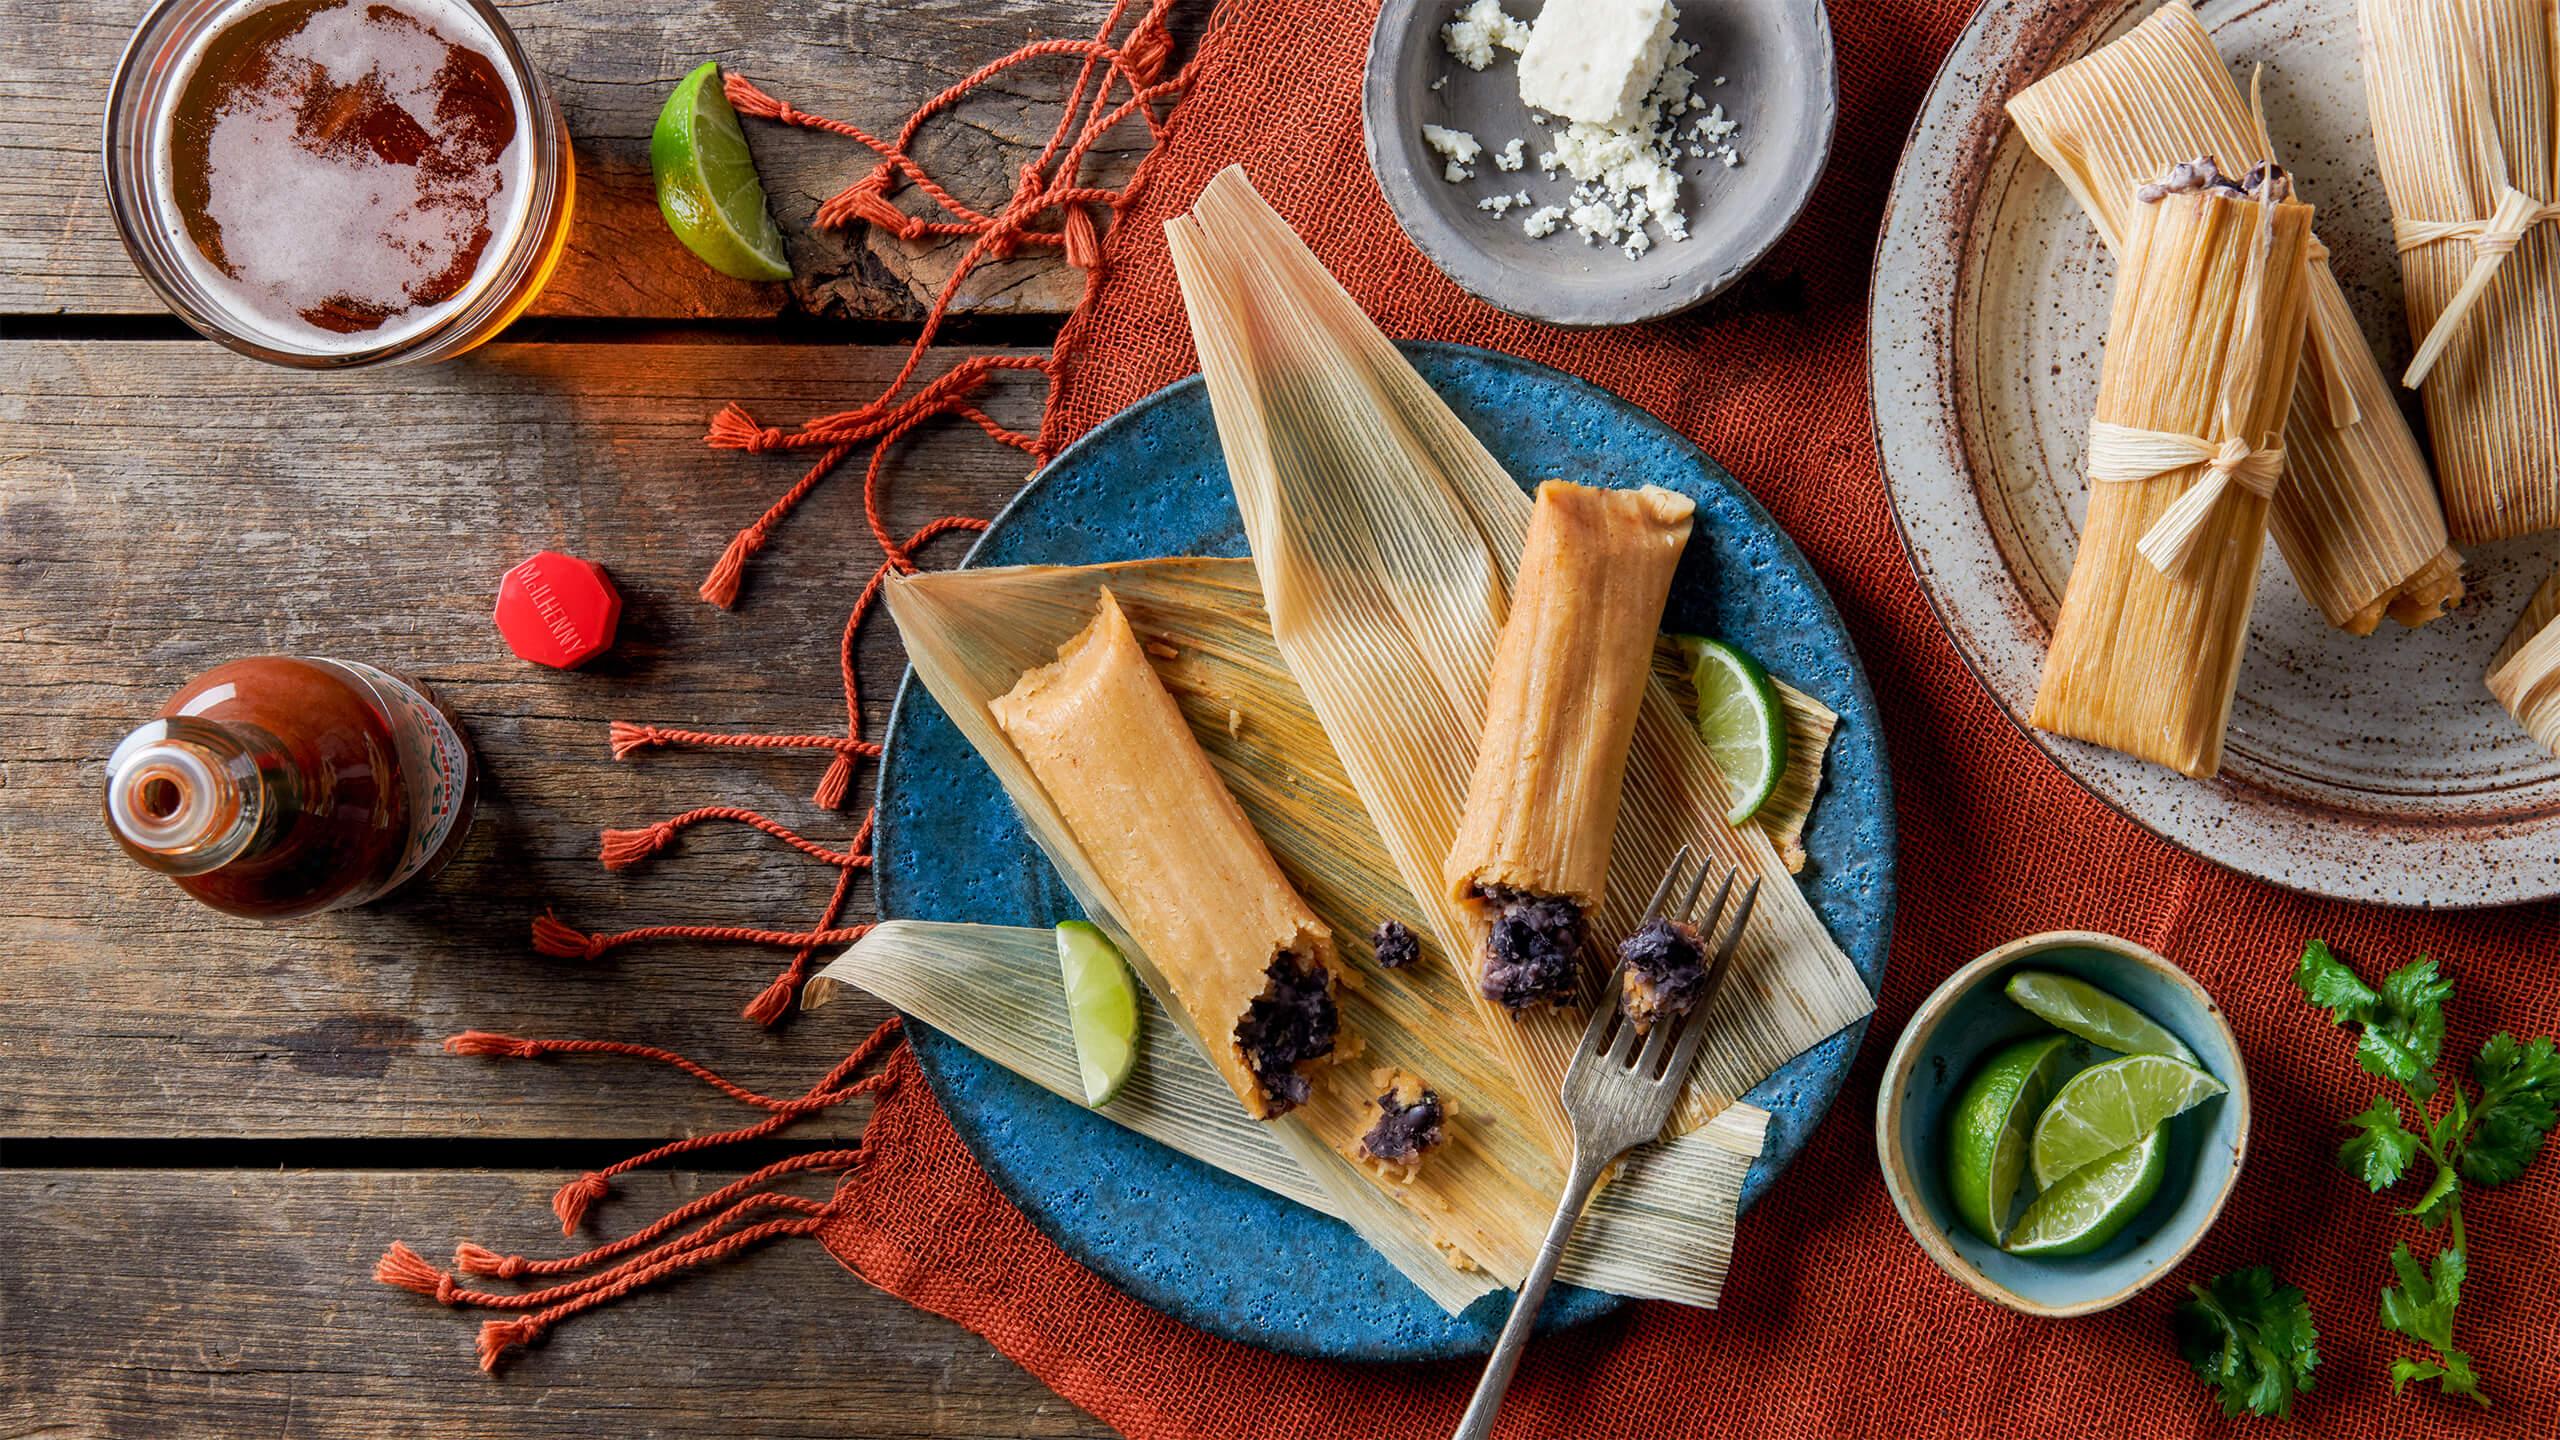 Black Bean Chipotle Oaxaca Cheese Tamales